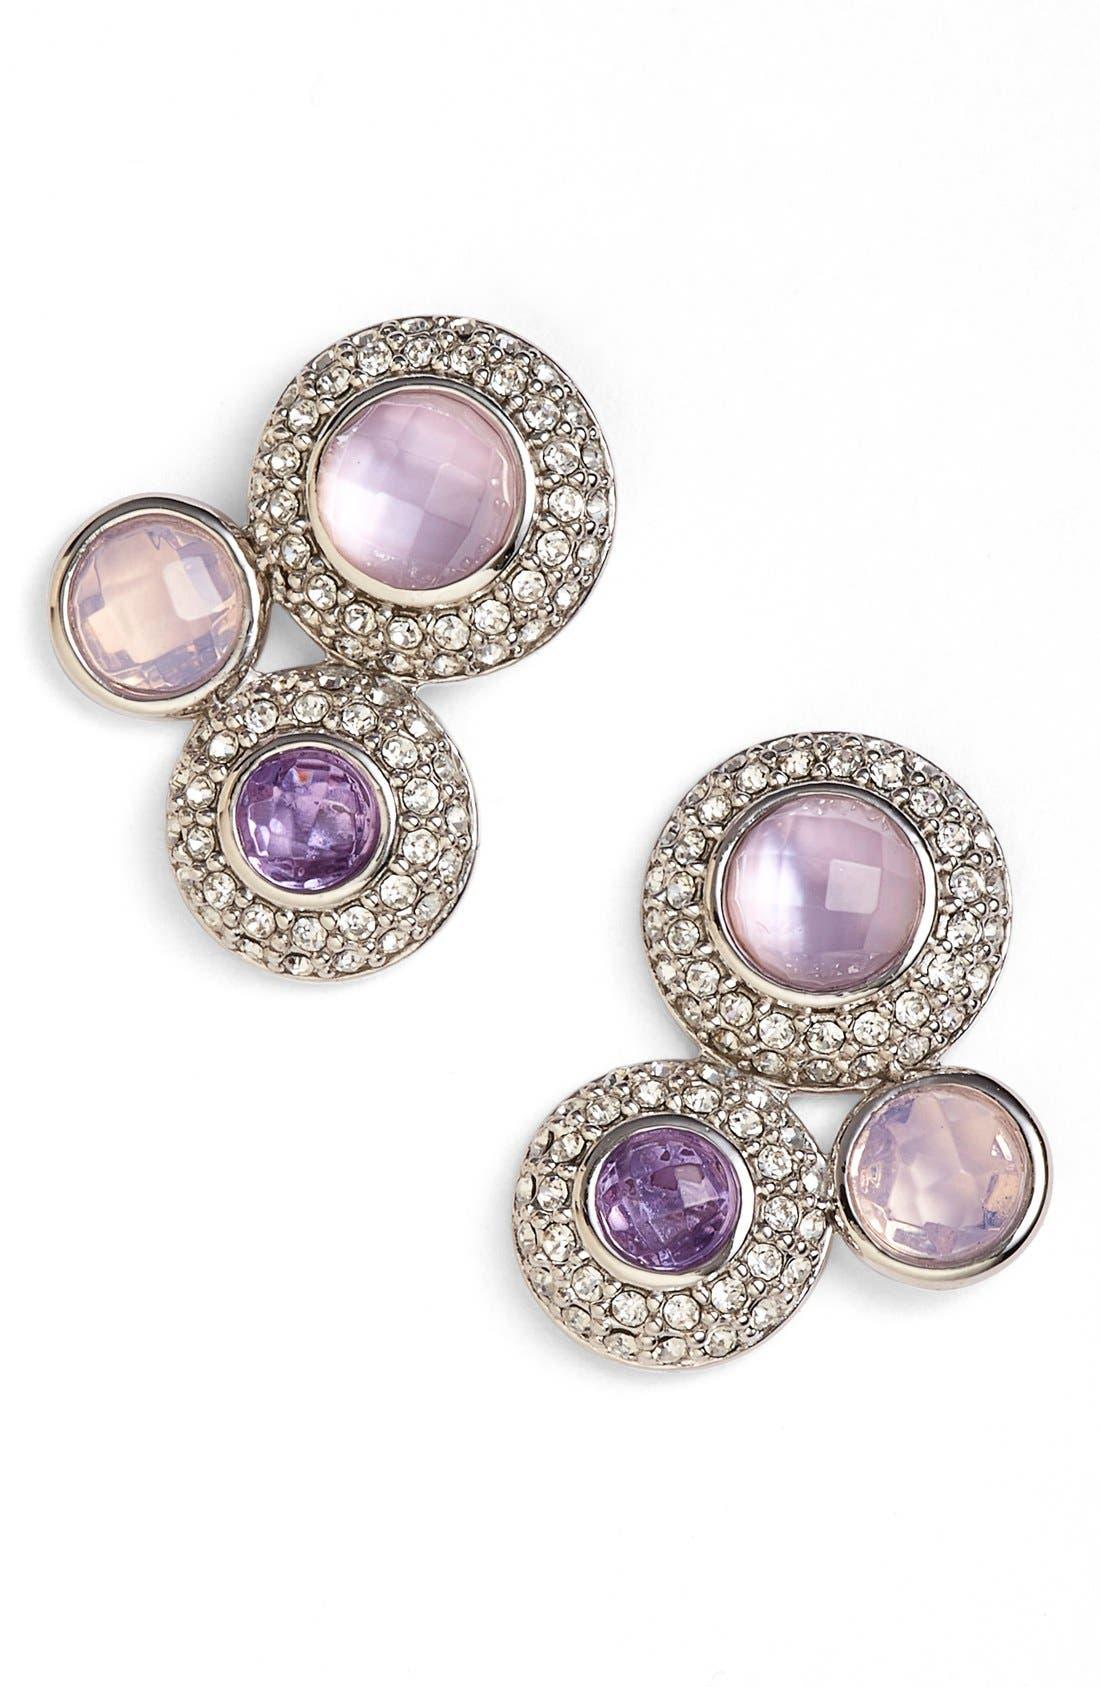 Main Image - Judith Jack Jeweled Cluster Stud Earrings